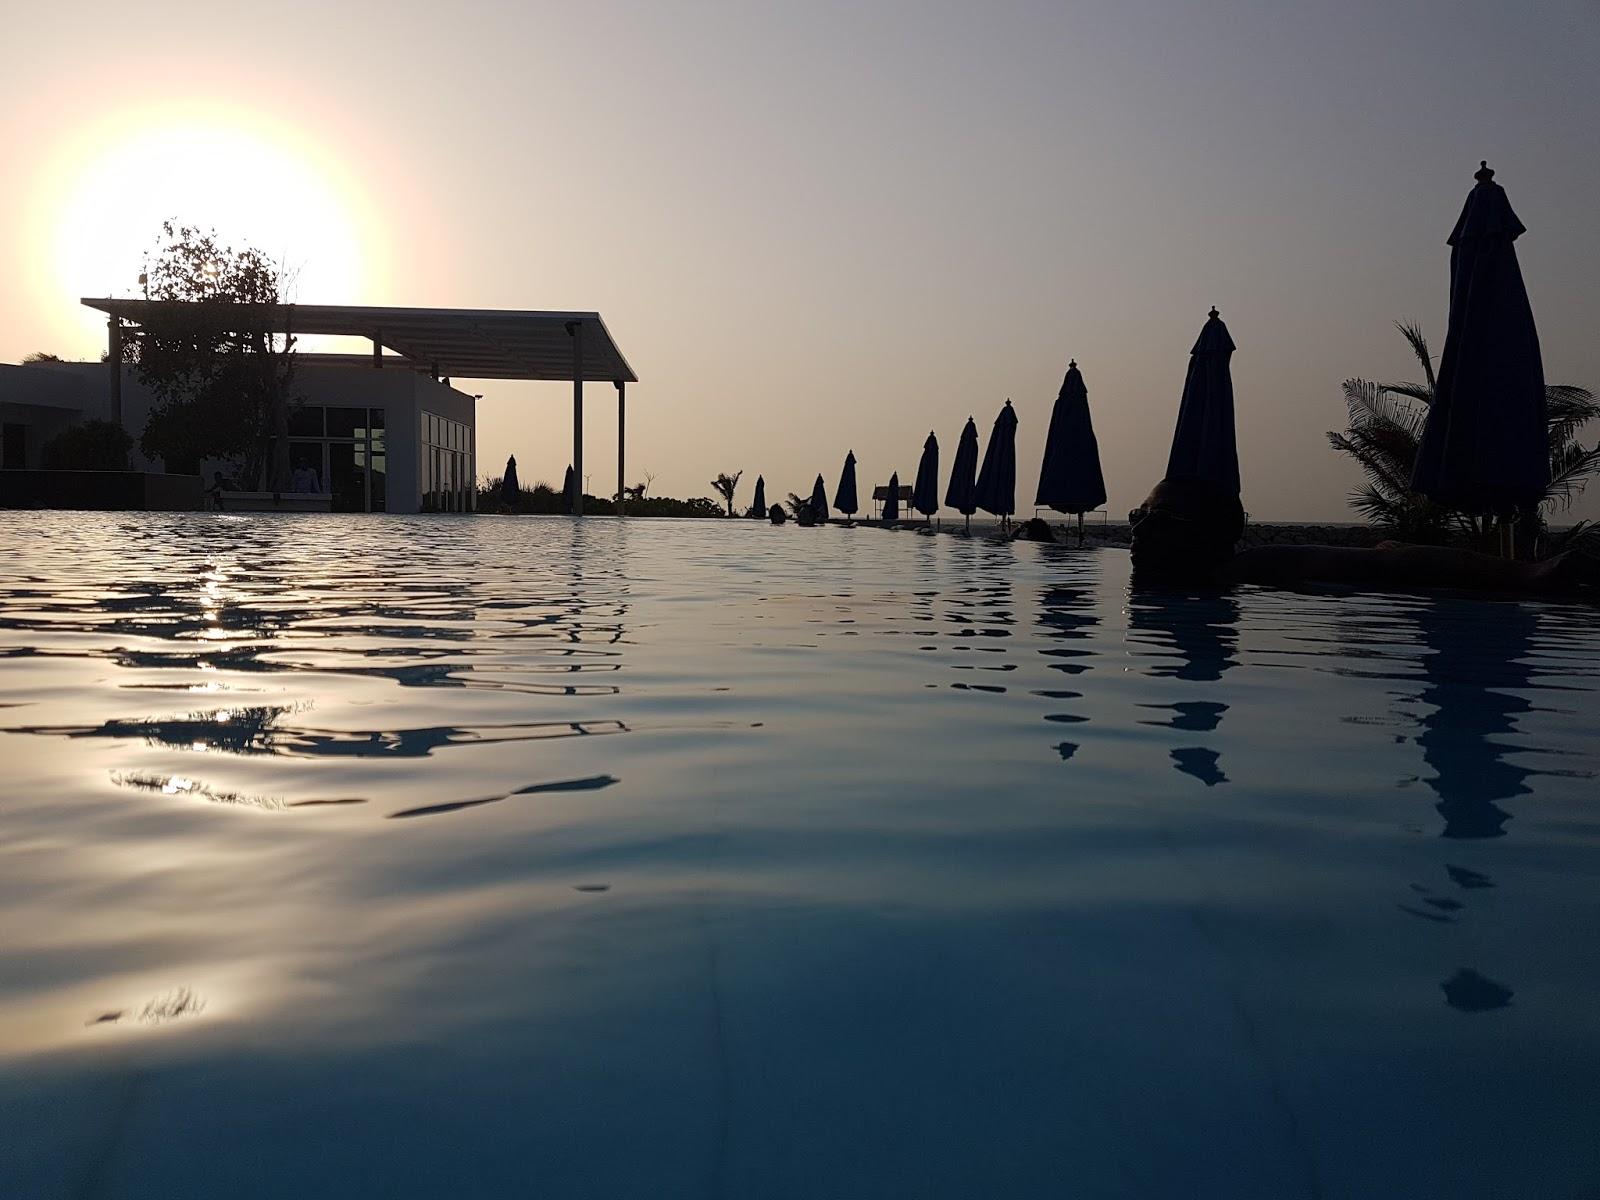 Zaya Nurai Island Abu Dhabi